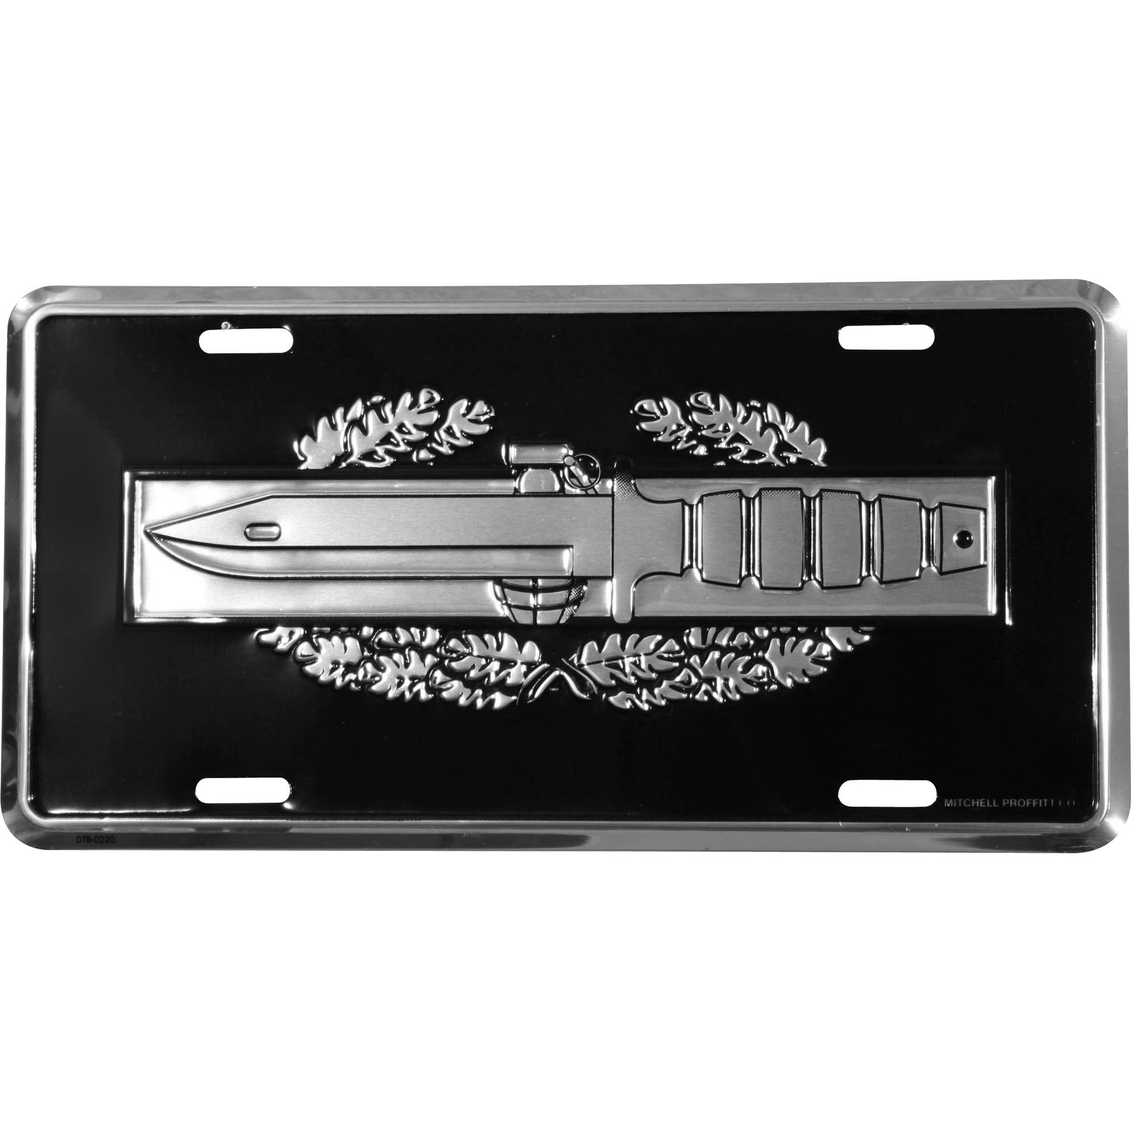 Mitchell Proffitt Combat Action Badge Black License Plate